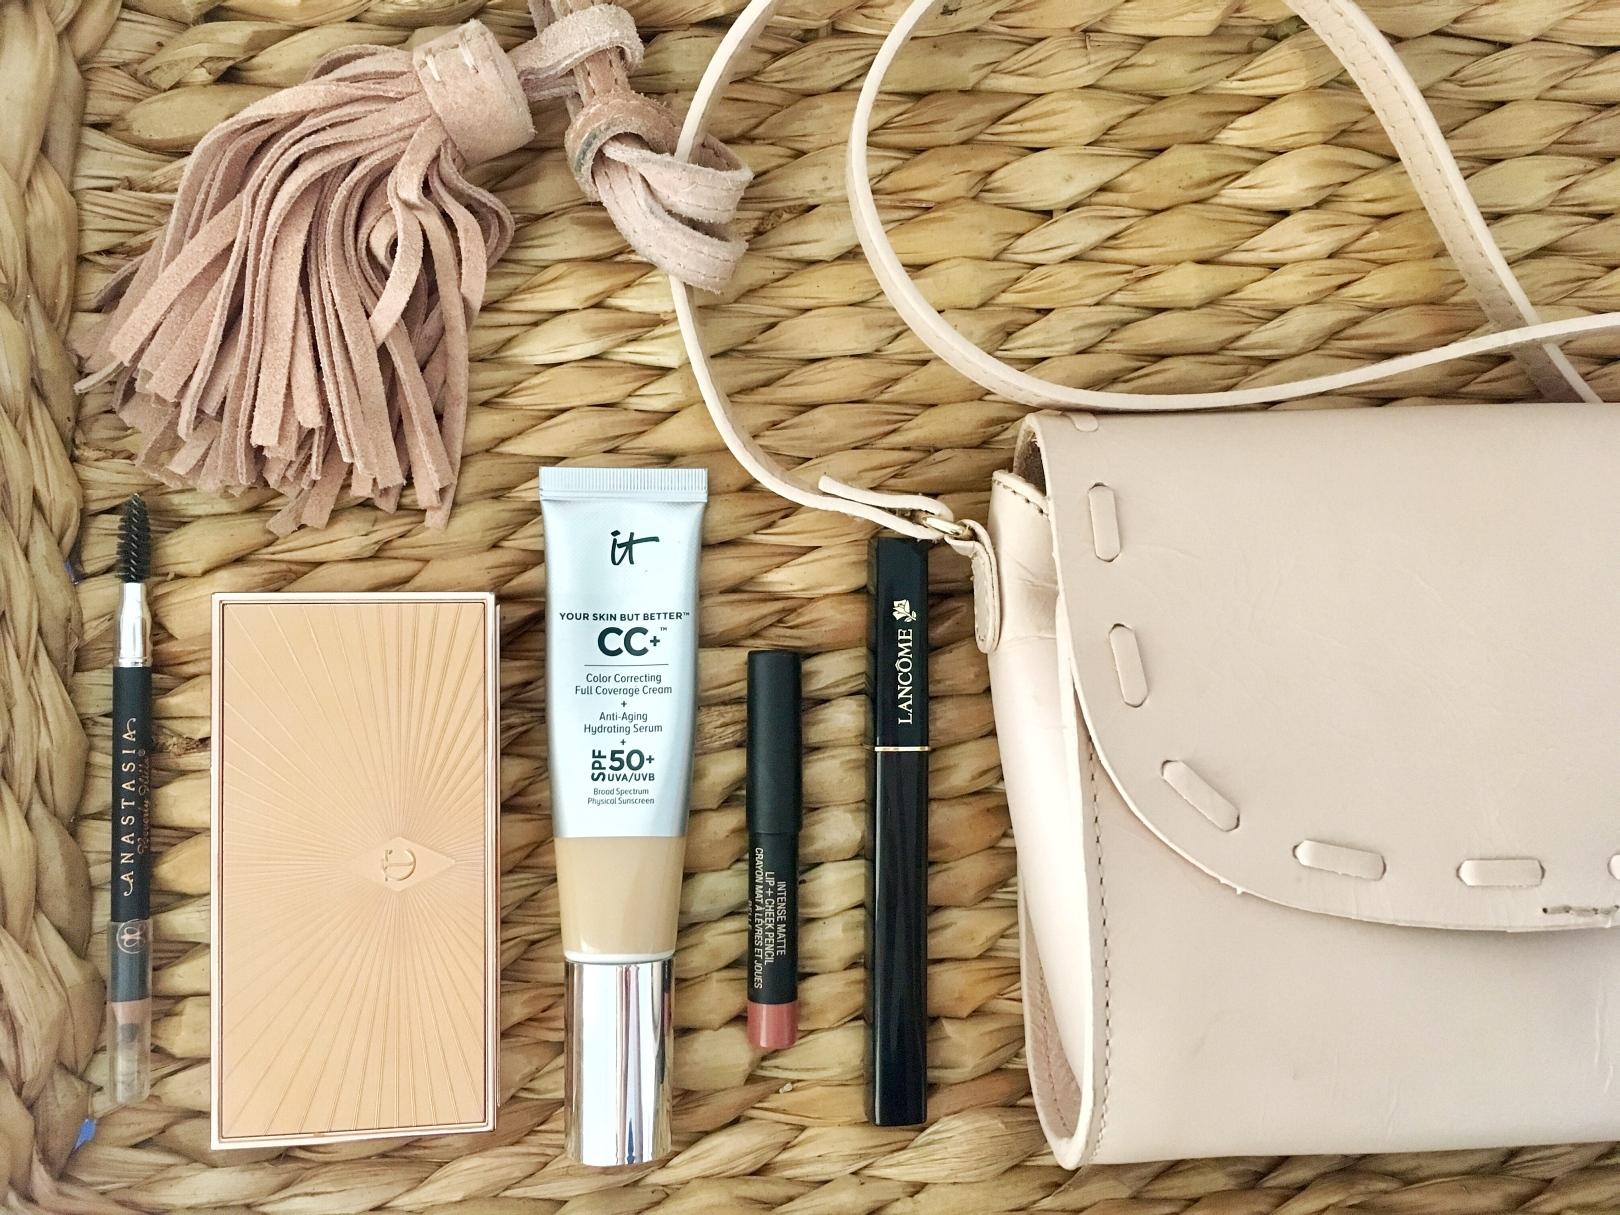 Easy 5 Product Makeup Look f/ It Cosmetics CC+ Cream, Charlotte Tilbury Filmstars Bronze and Glow Palette, Nudestix Lip + Cheek Pencil   keiralennox.com